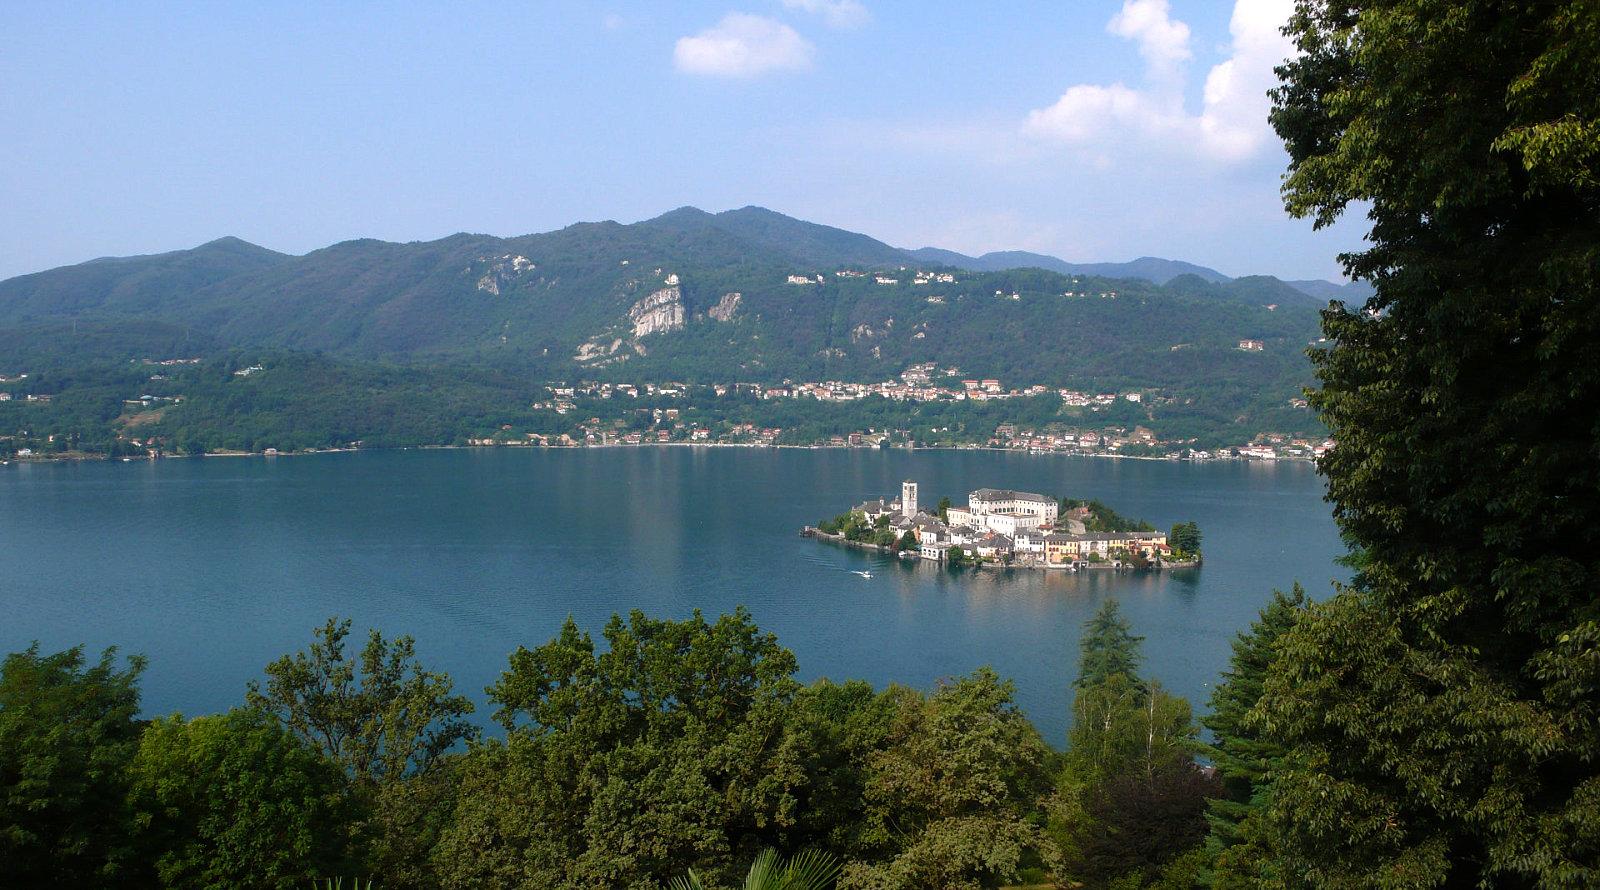 Veduta panoramica sull'isola di San Giulio. Lago d'Orta